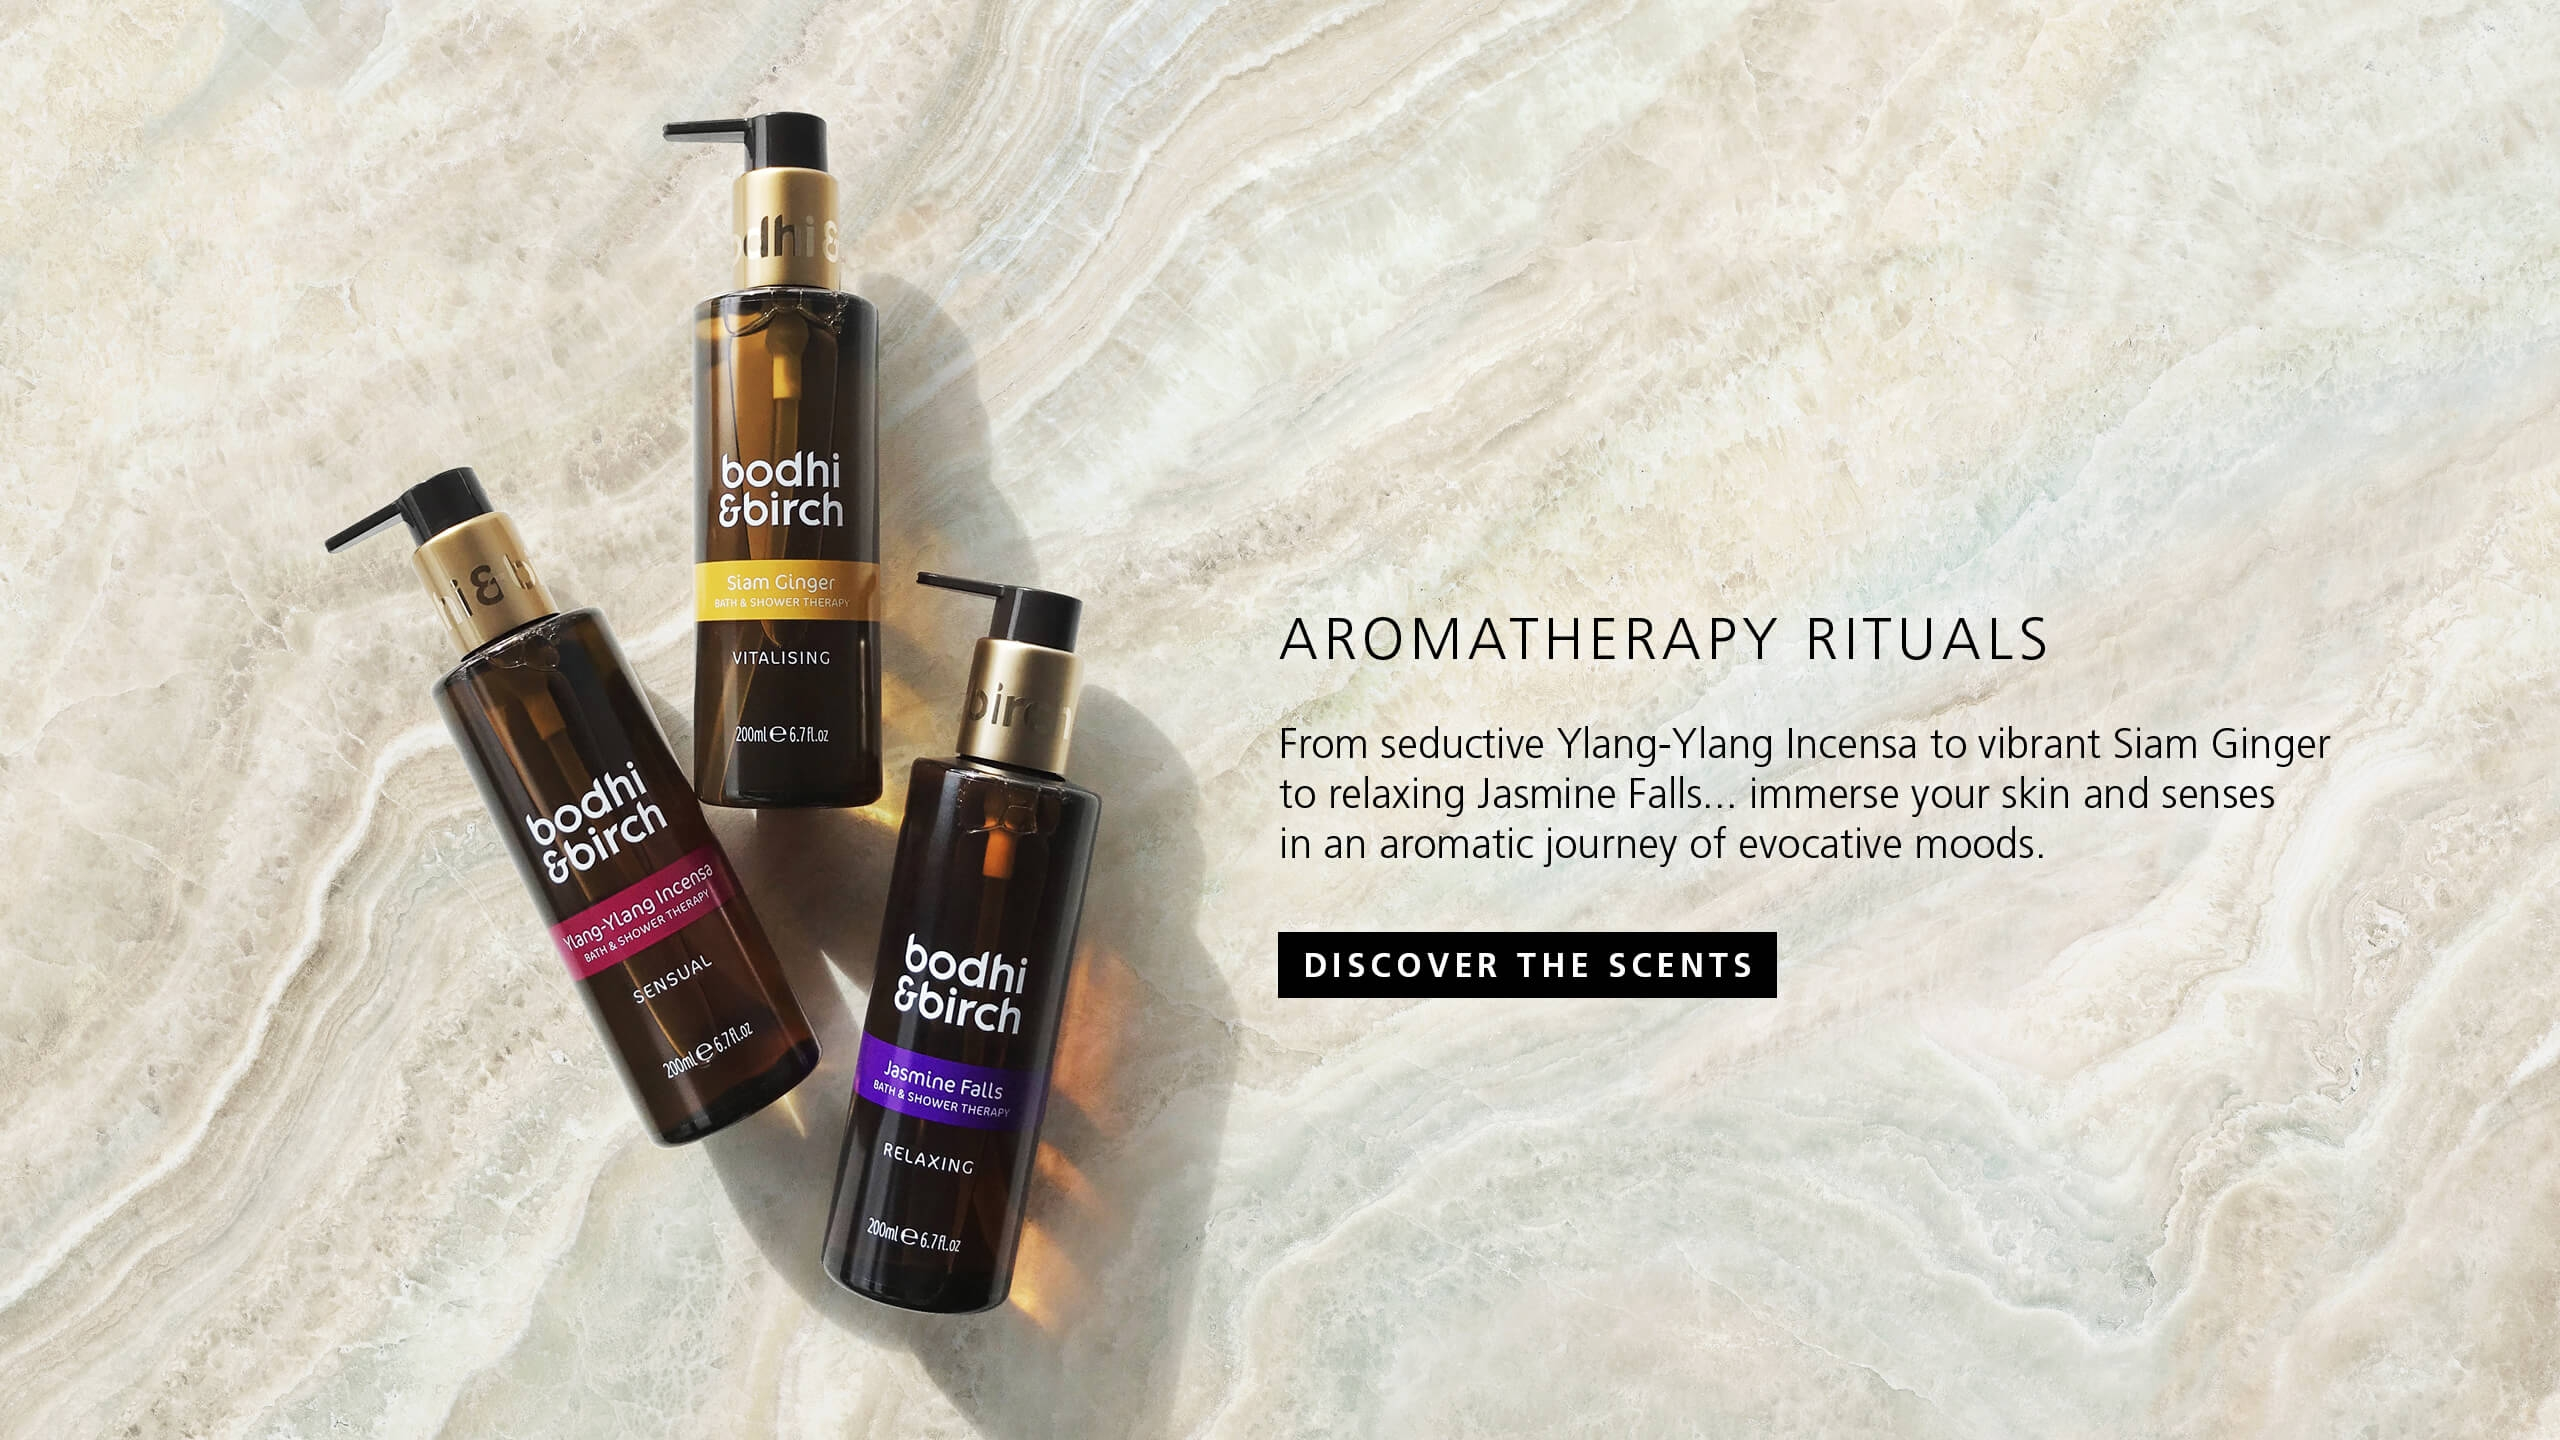 Aromatherapy Rituals